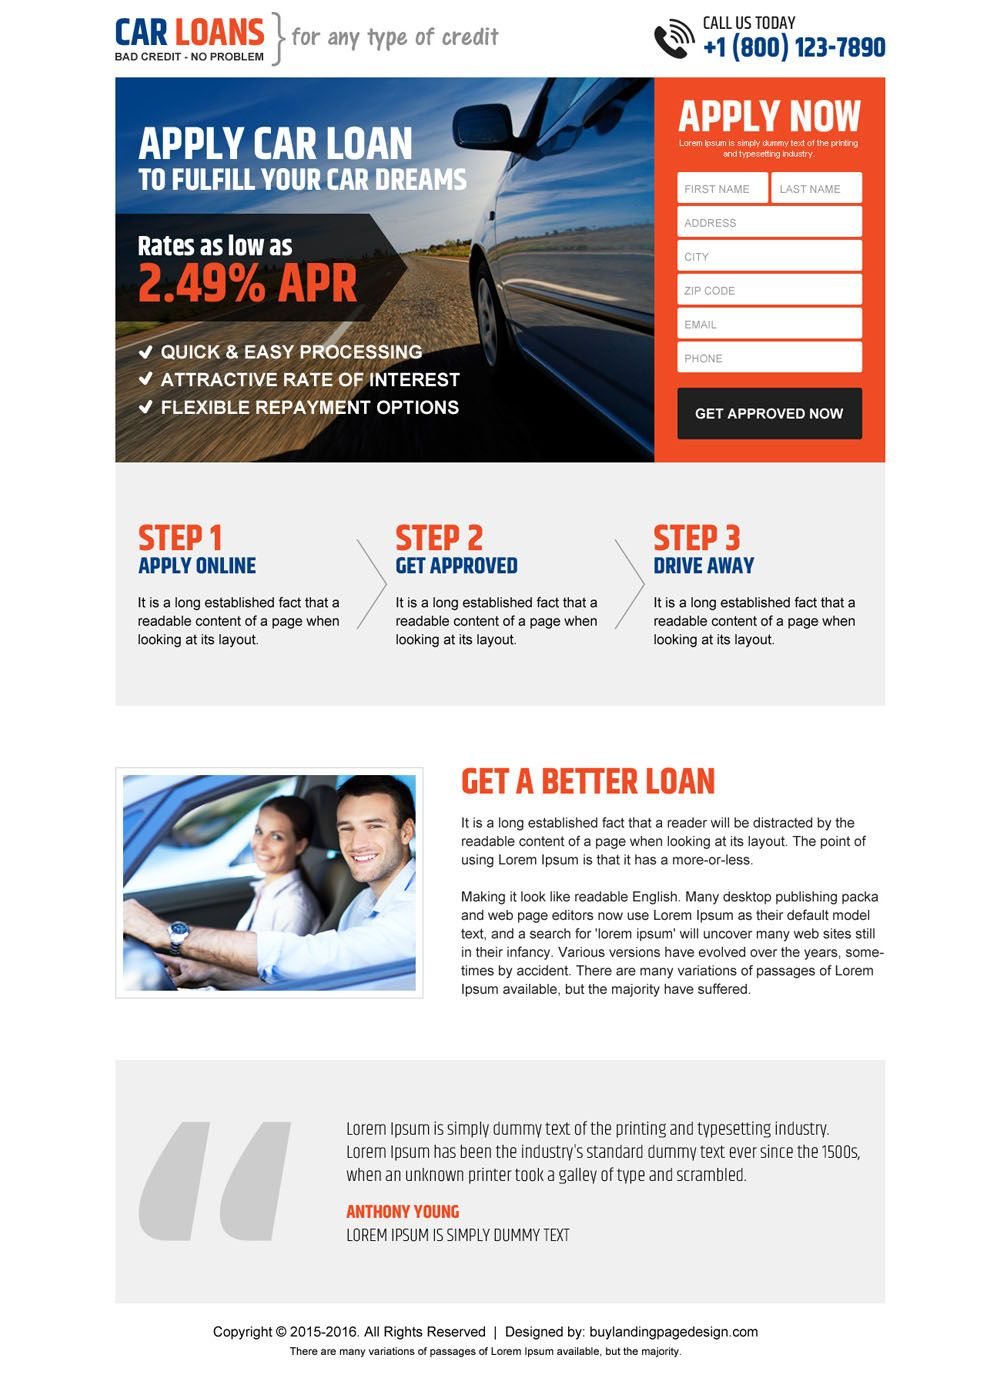 clean car loan responsive landing page design template   car loan ...